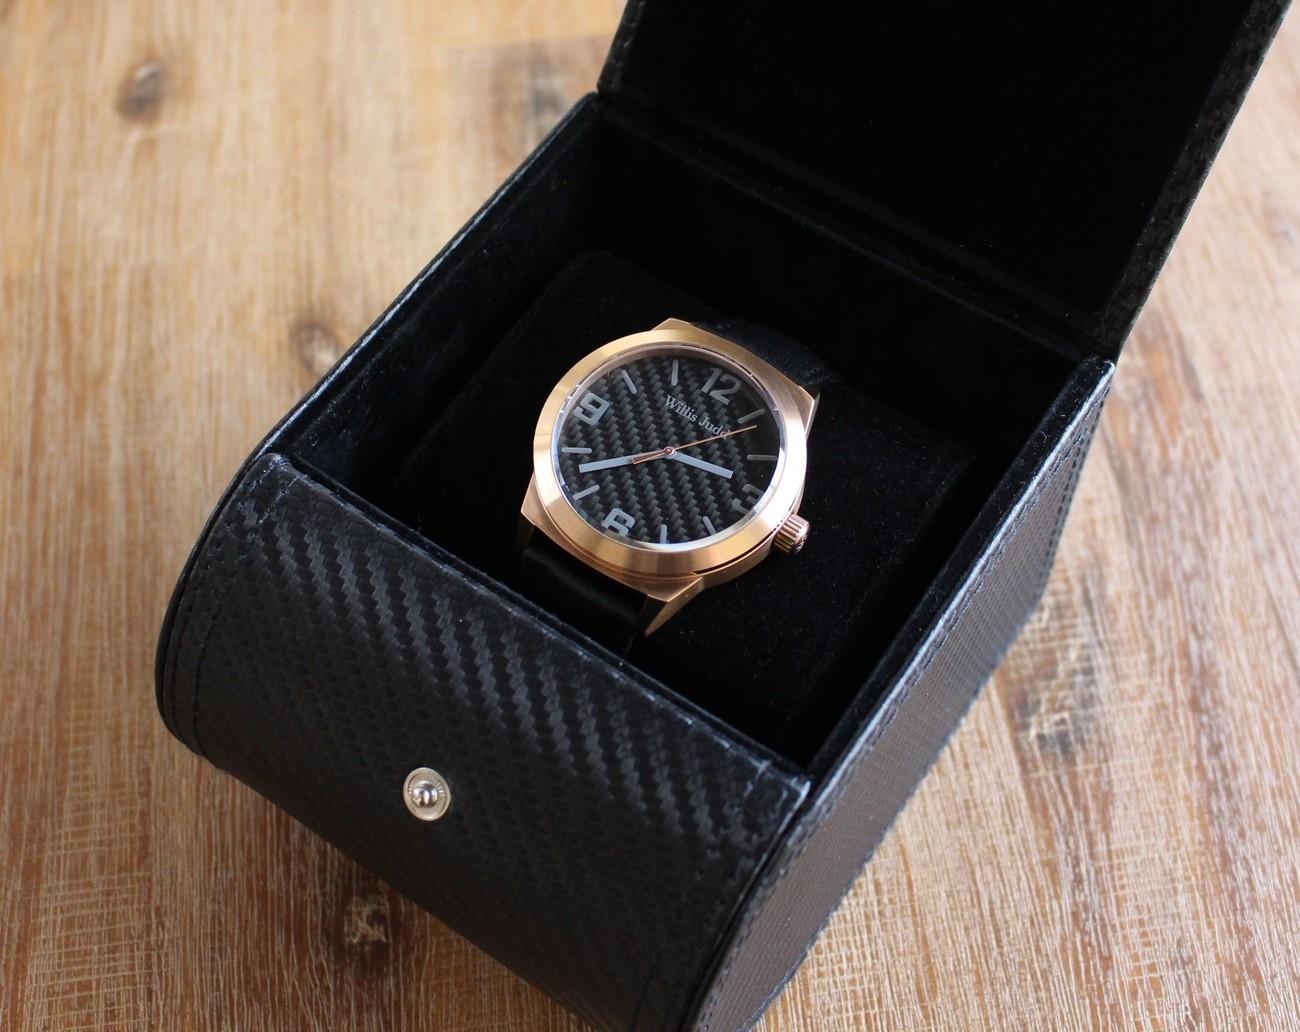 Carbon+Fiber+Watch+Made+Affordable+%26%238211%3B+Designed+In+Australia